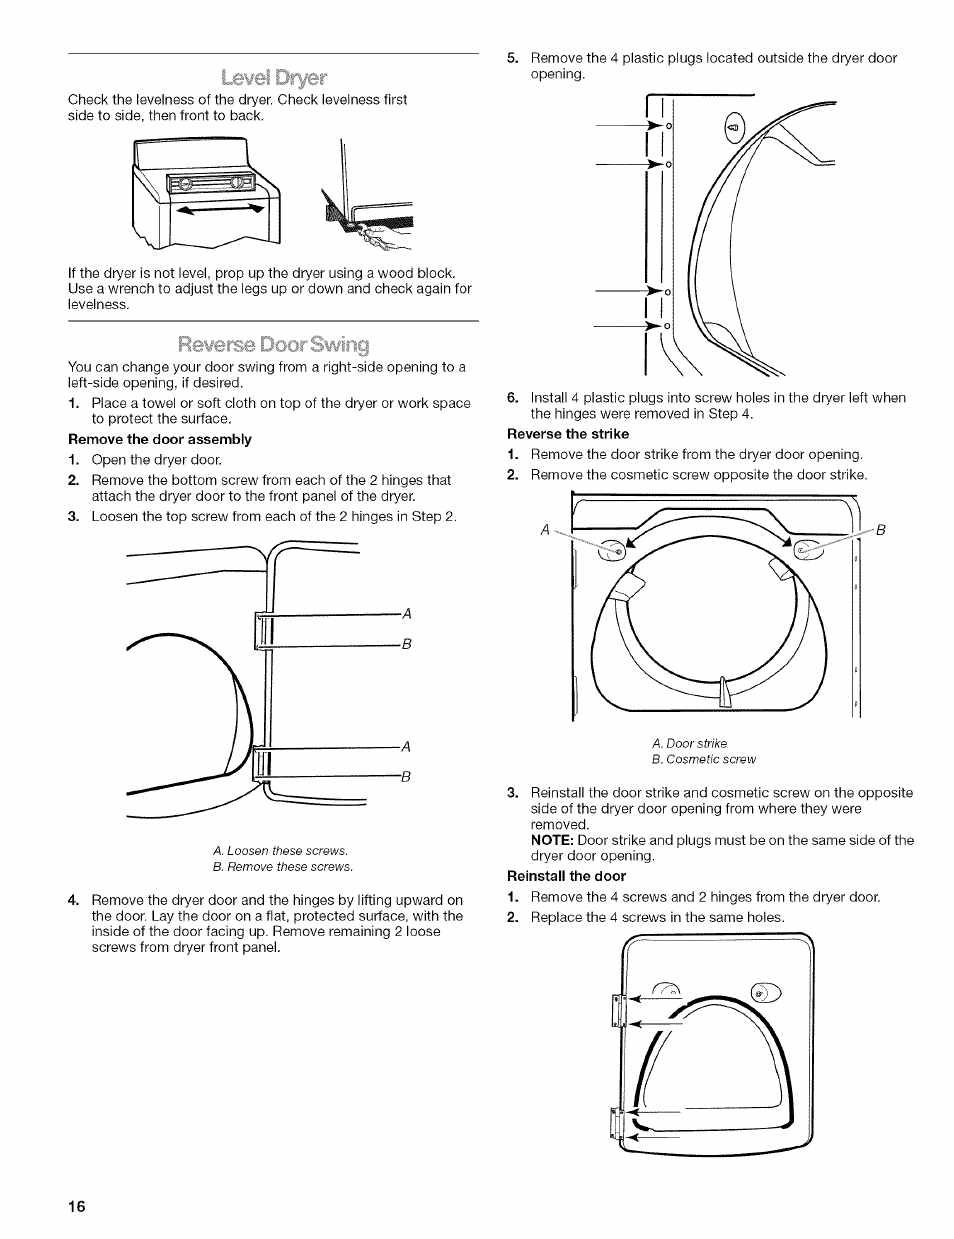 medium resolution of kenmore he3 dryer heating element wiring diagram electric kenmore electric dryer wiring diagram kenmore electric dryer